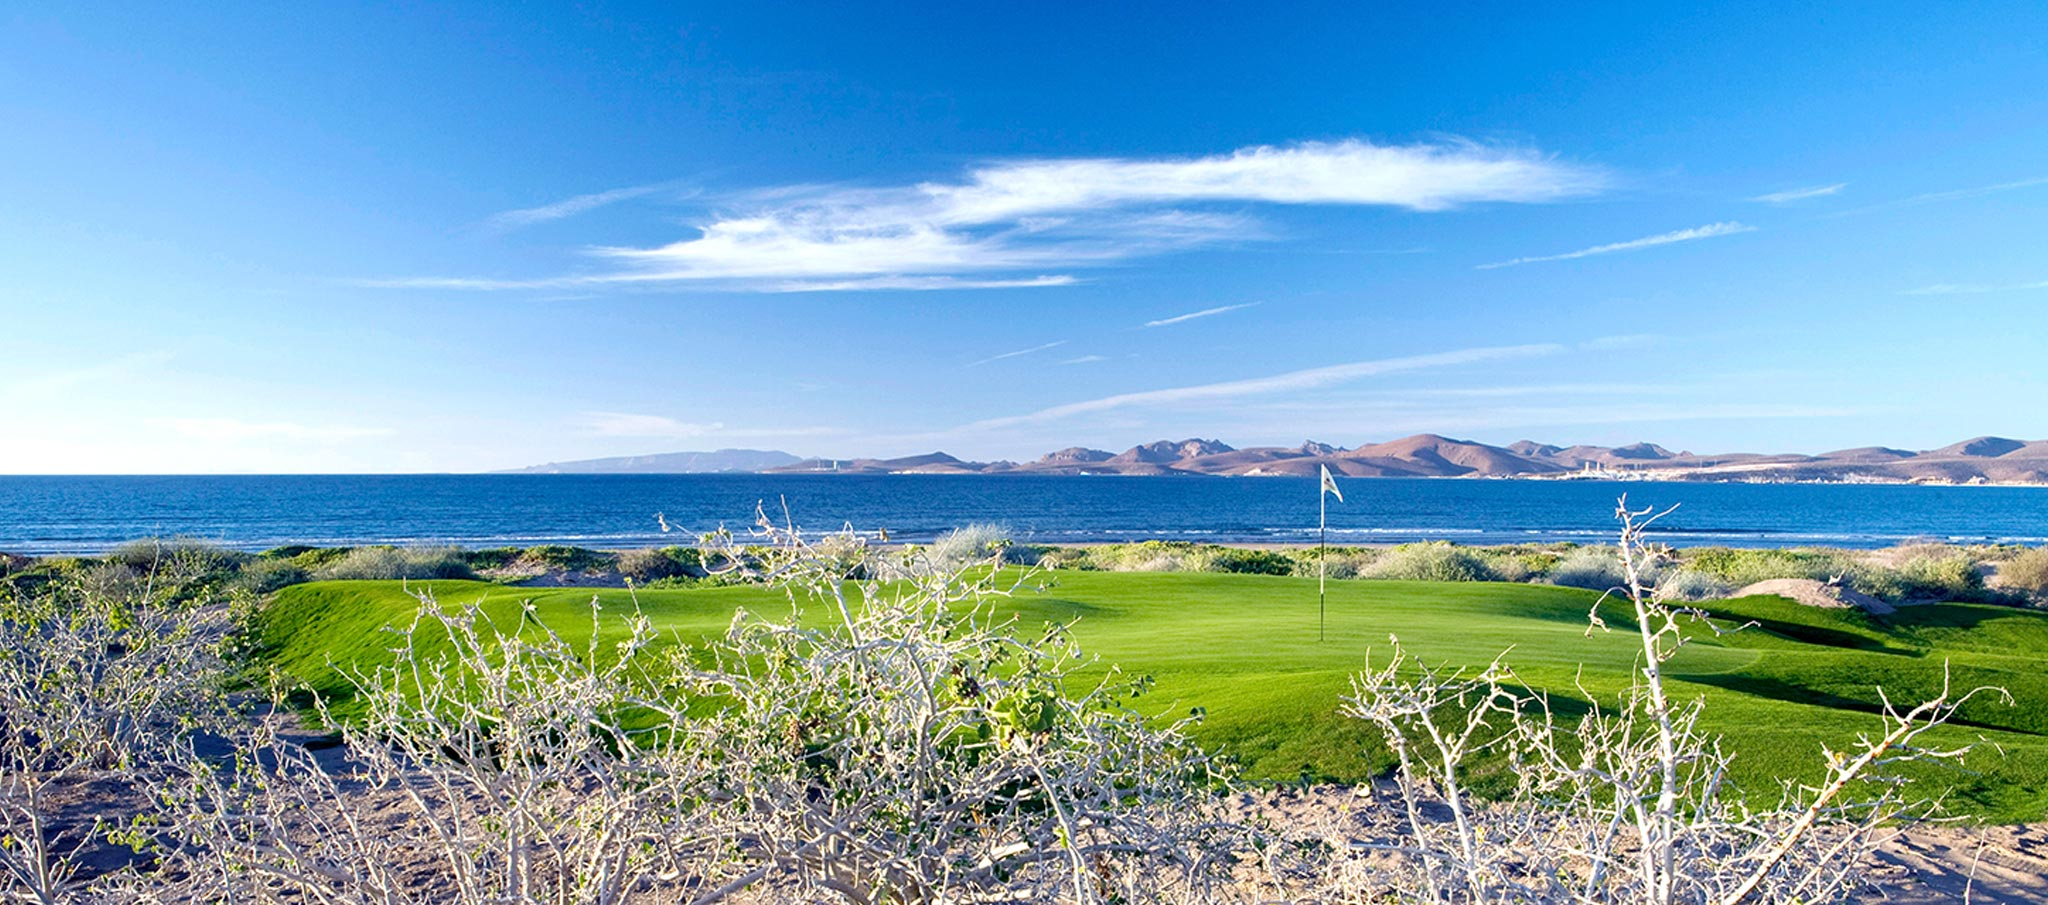 Golf at Paraiso Del Mar